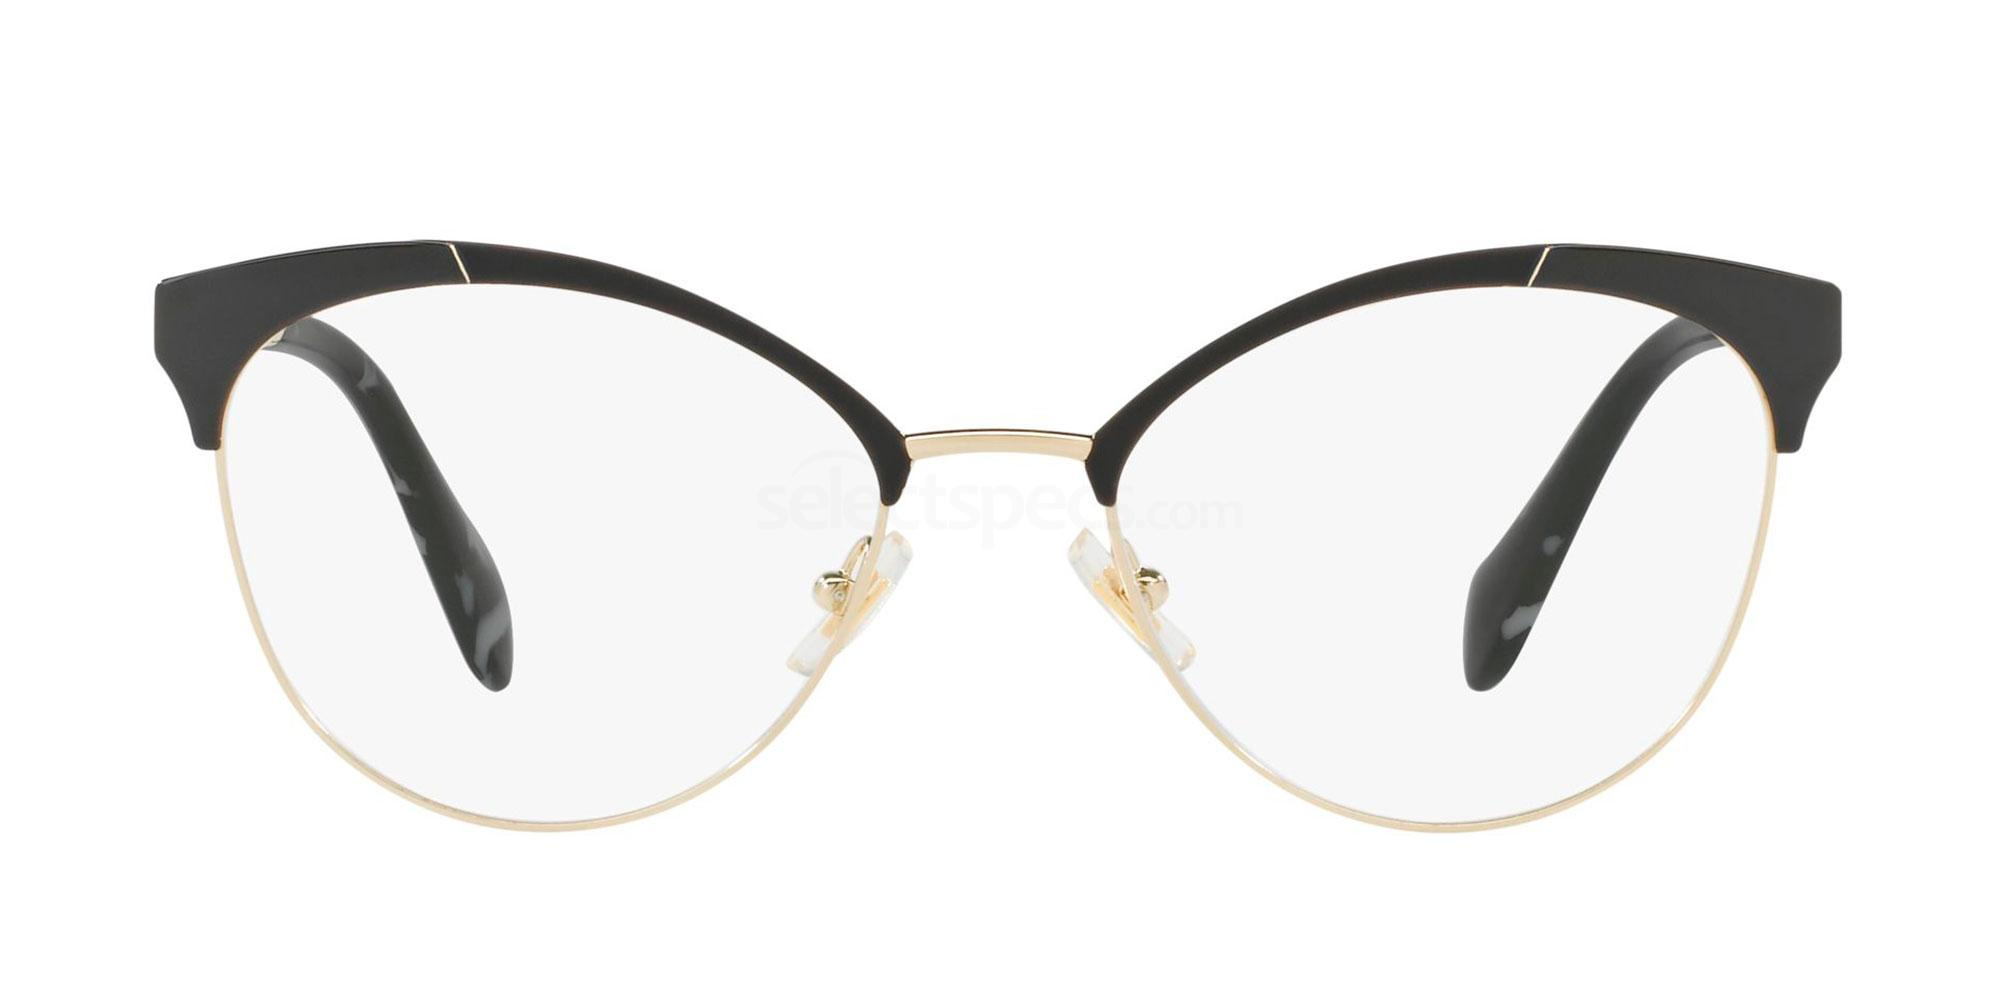 1AB1O1 MU 50PV Glasses, Miu Miu